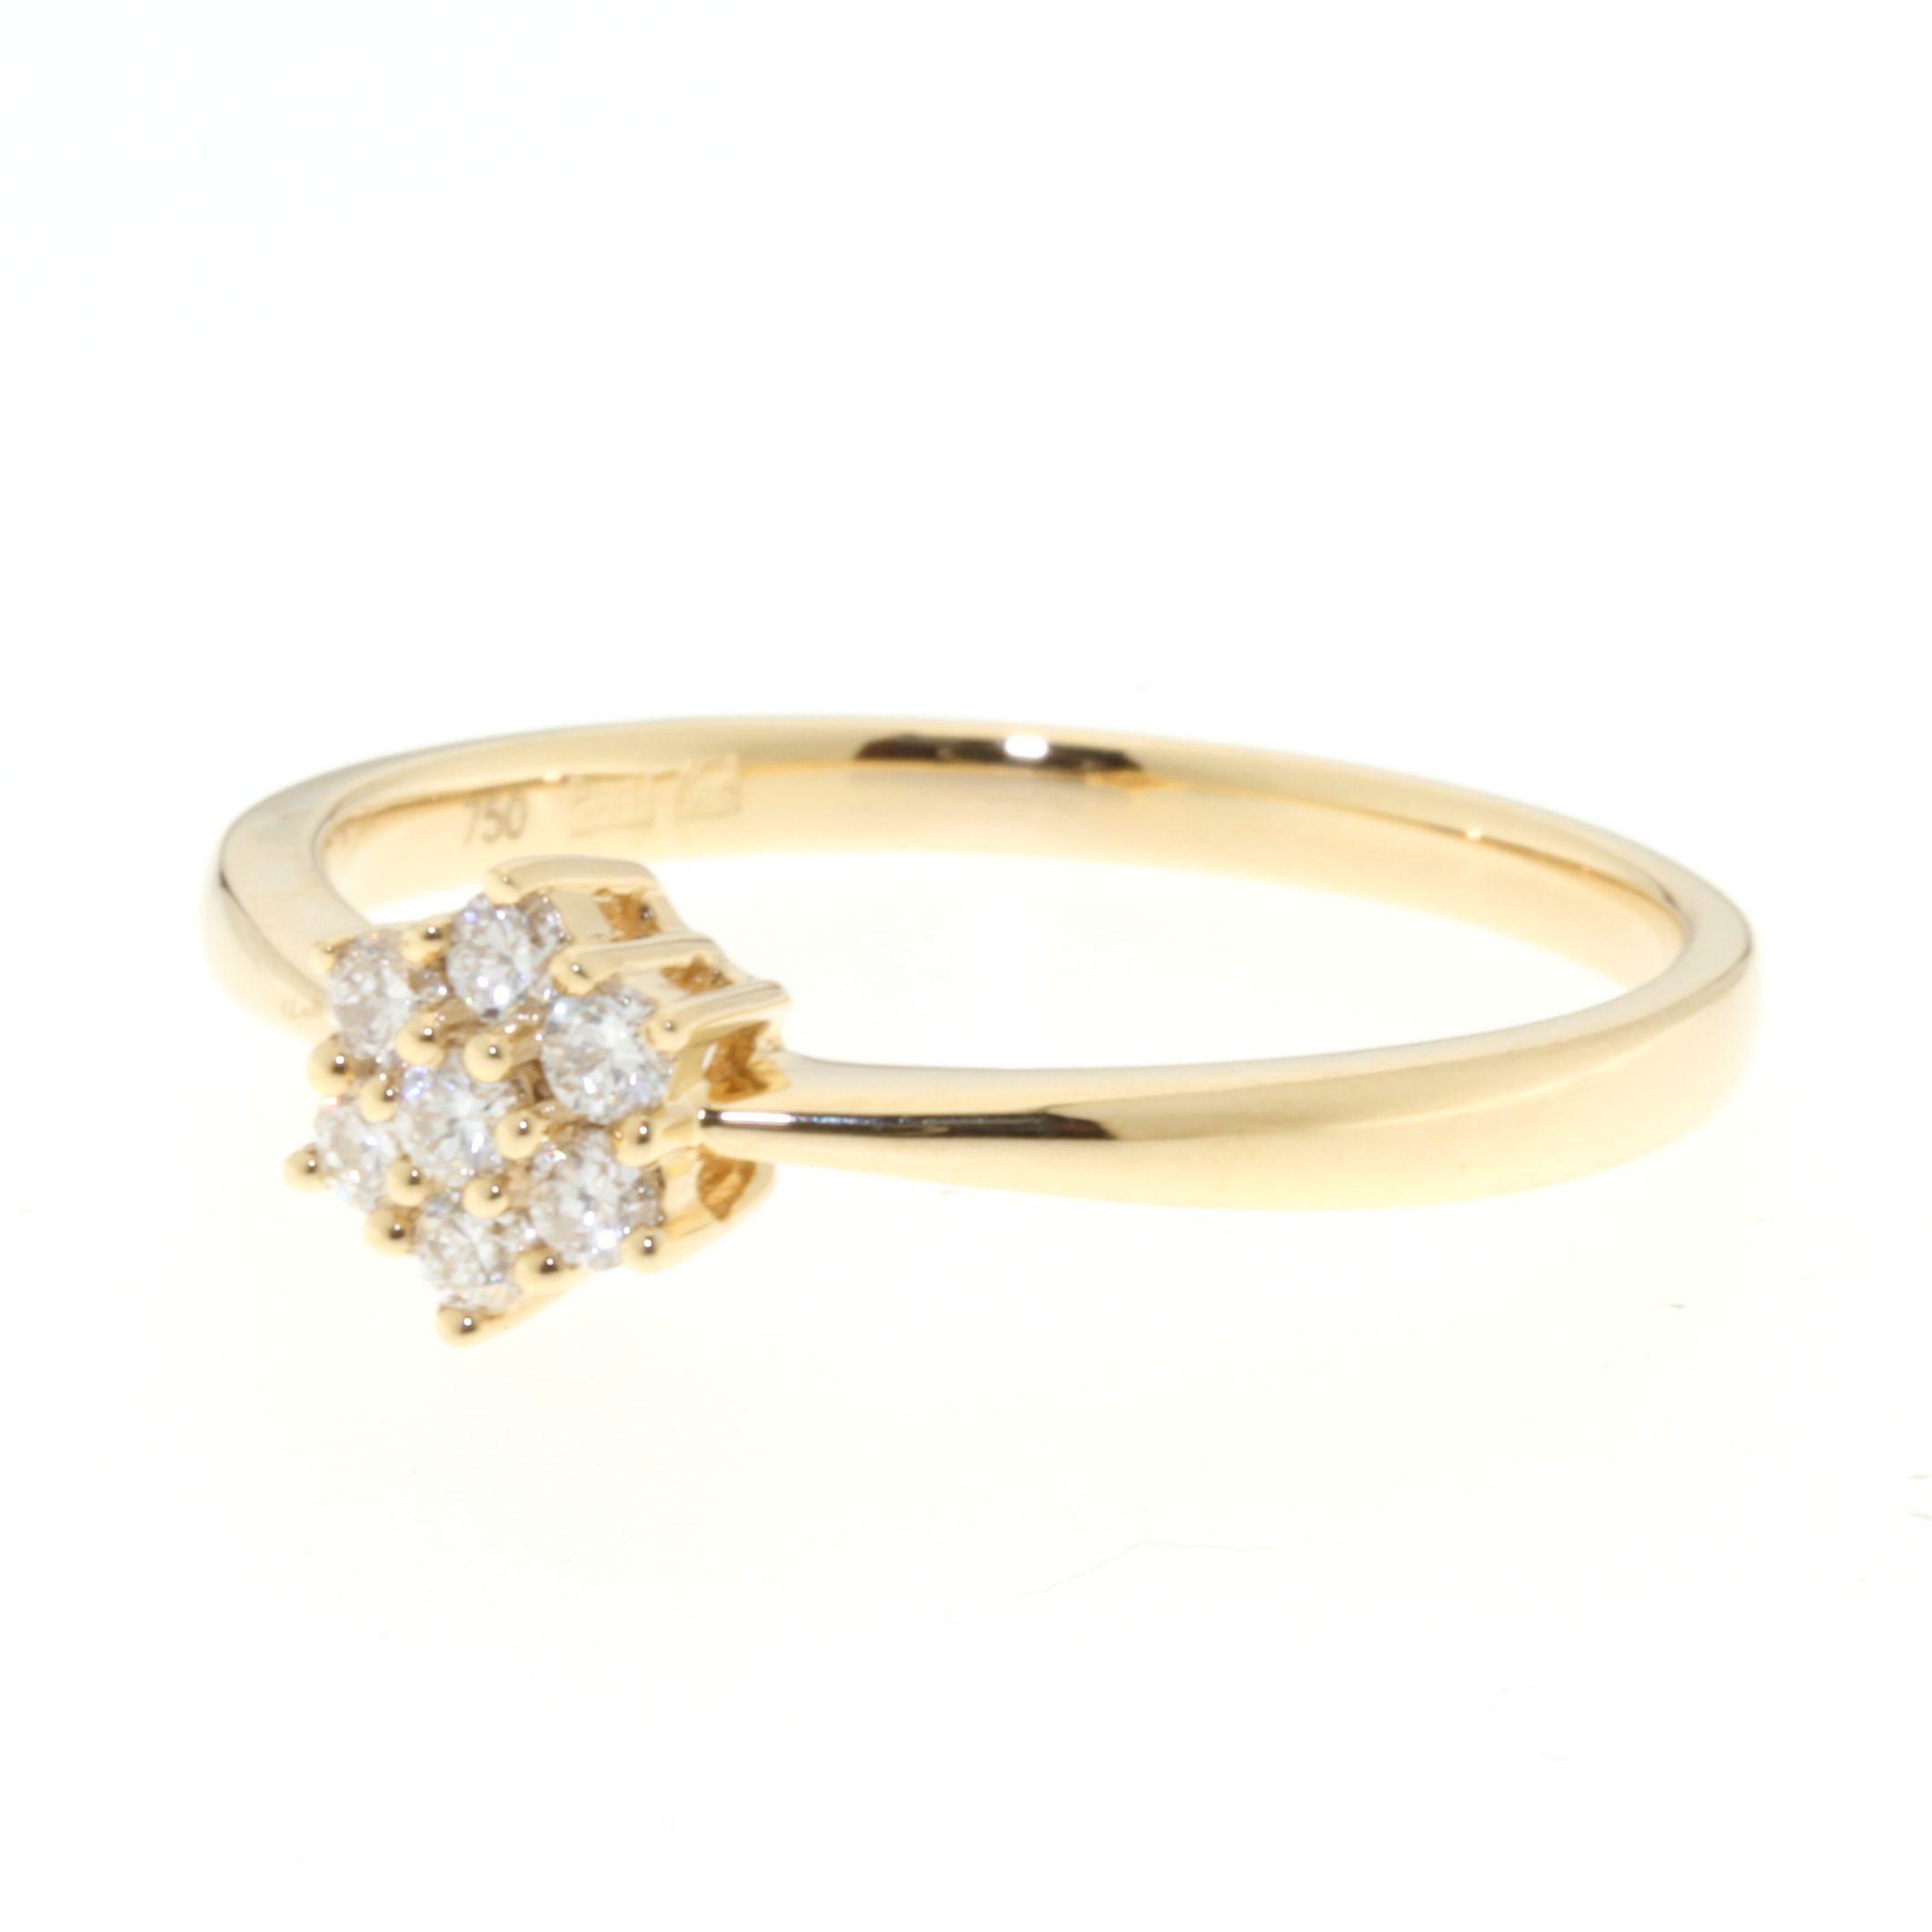 Ringen – Pagina 3 – Koh-i-Noor Diamonds a7298f530c72c